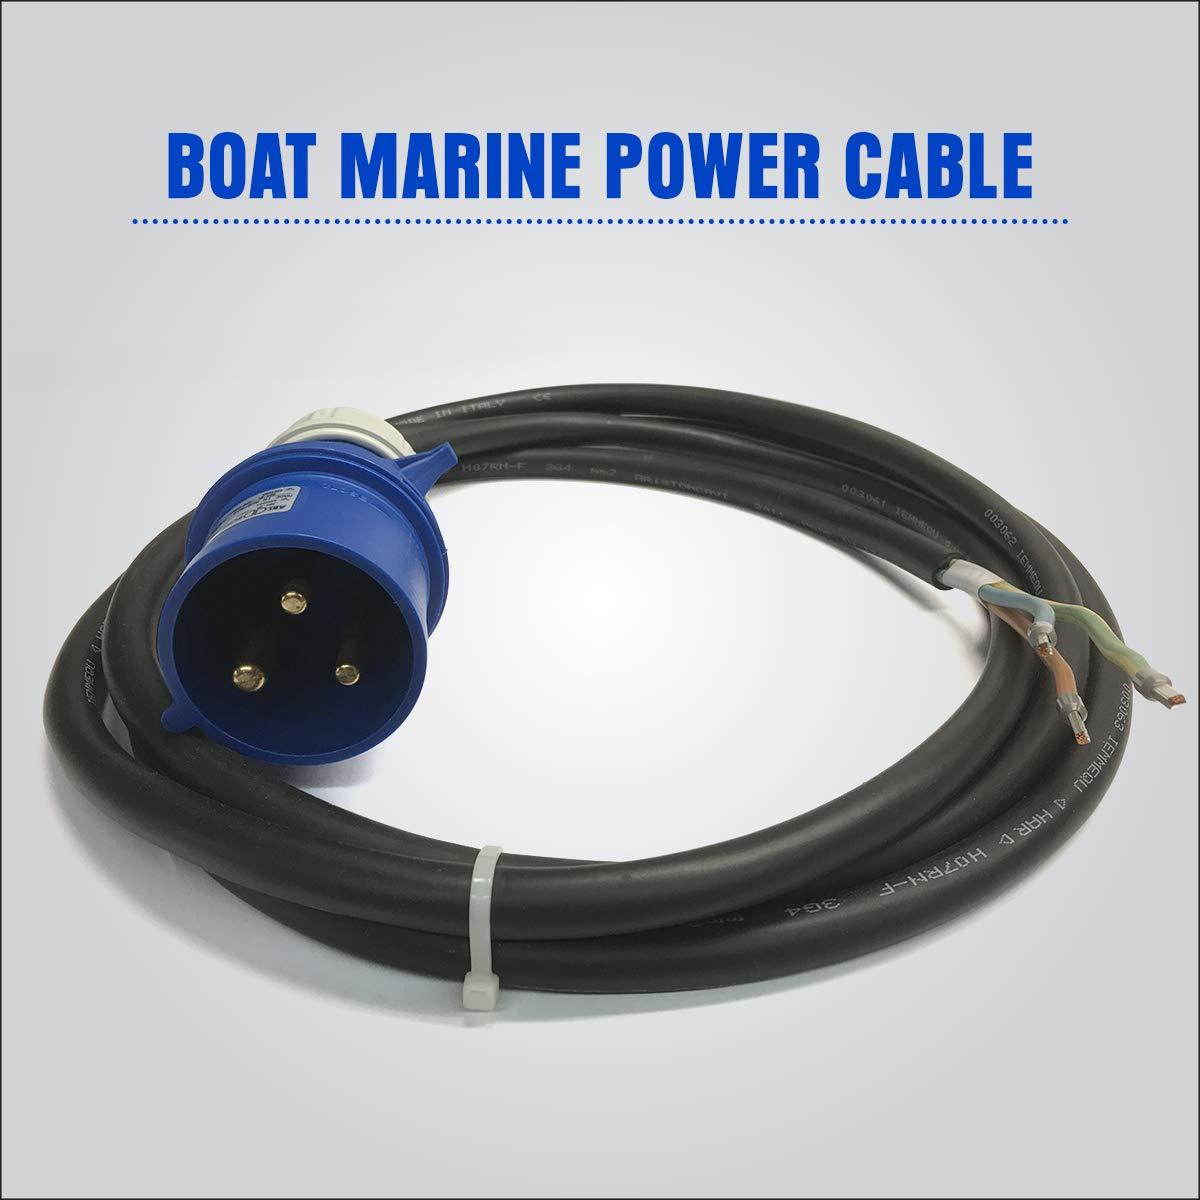 ABL Sursum S32S20A Plug M boat marine 30A 250V Power Wire Cable Cord